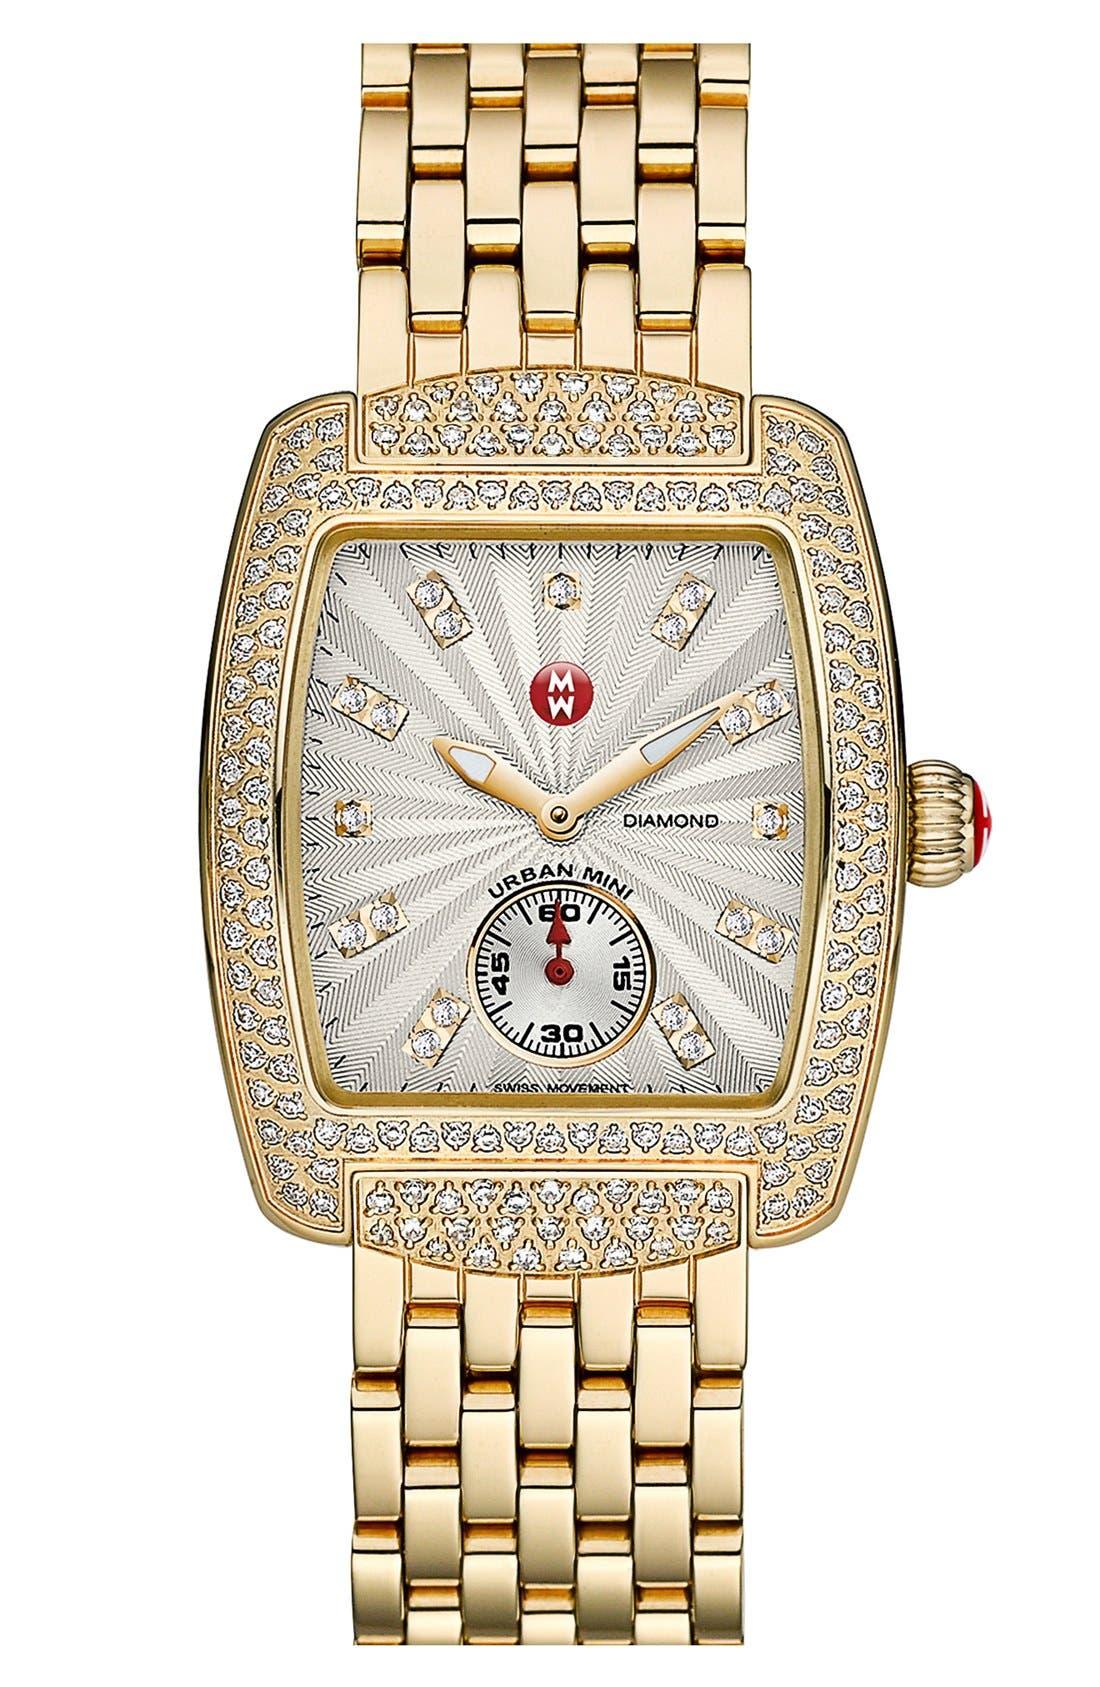 Alternate Image 2  - MICHELE 'Urban Mini Diamond' Diamond Dial Watch Case, 29mm x 30mm